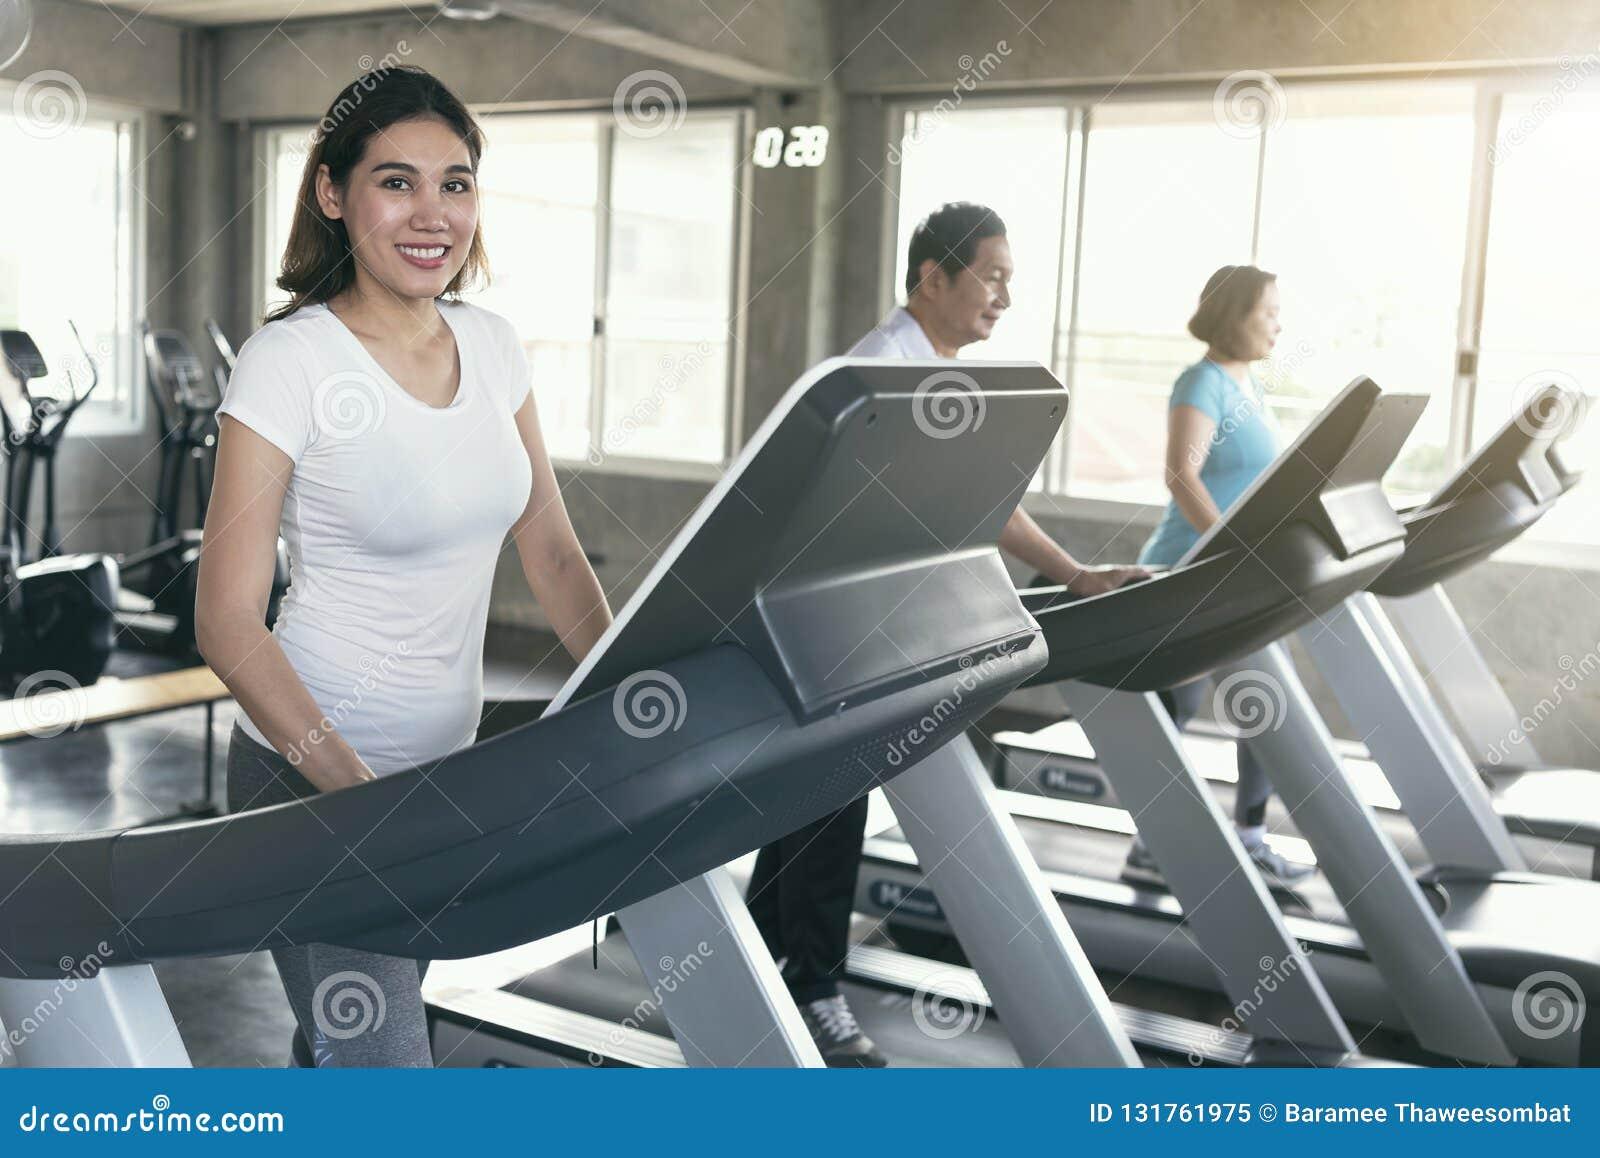 medicare free gym